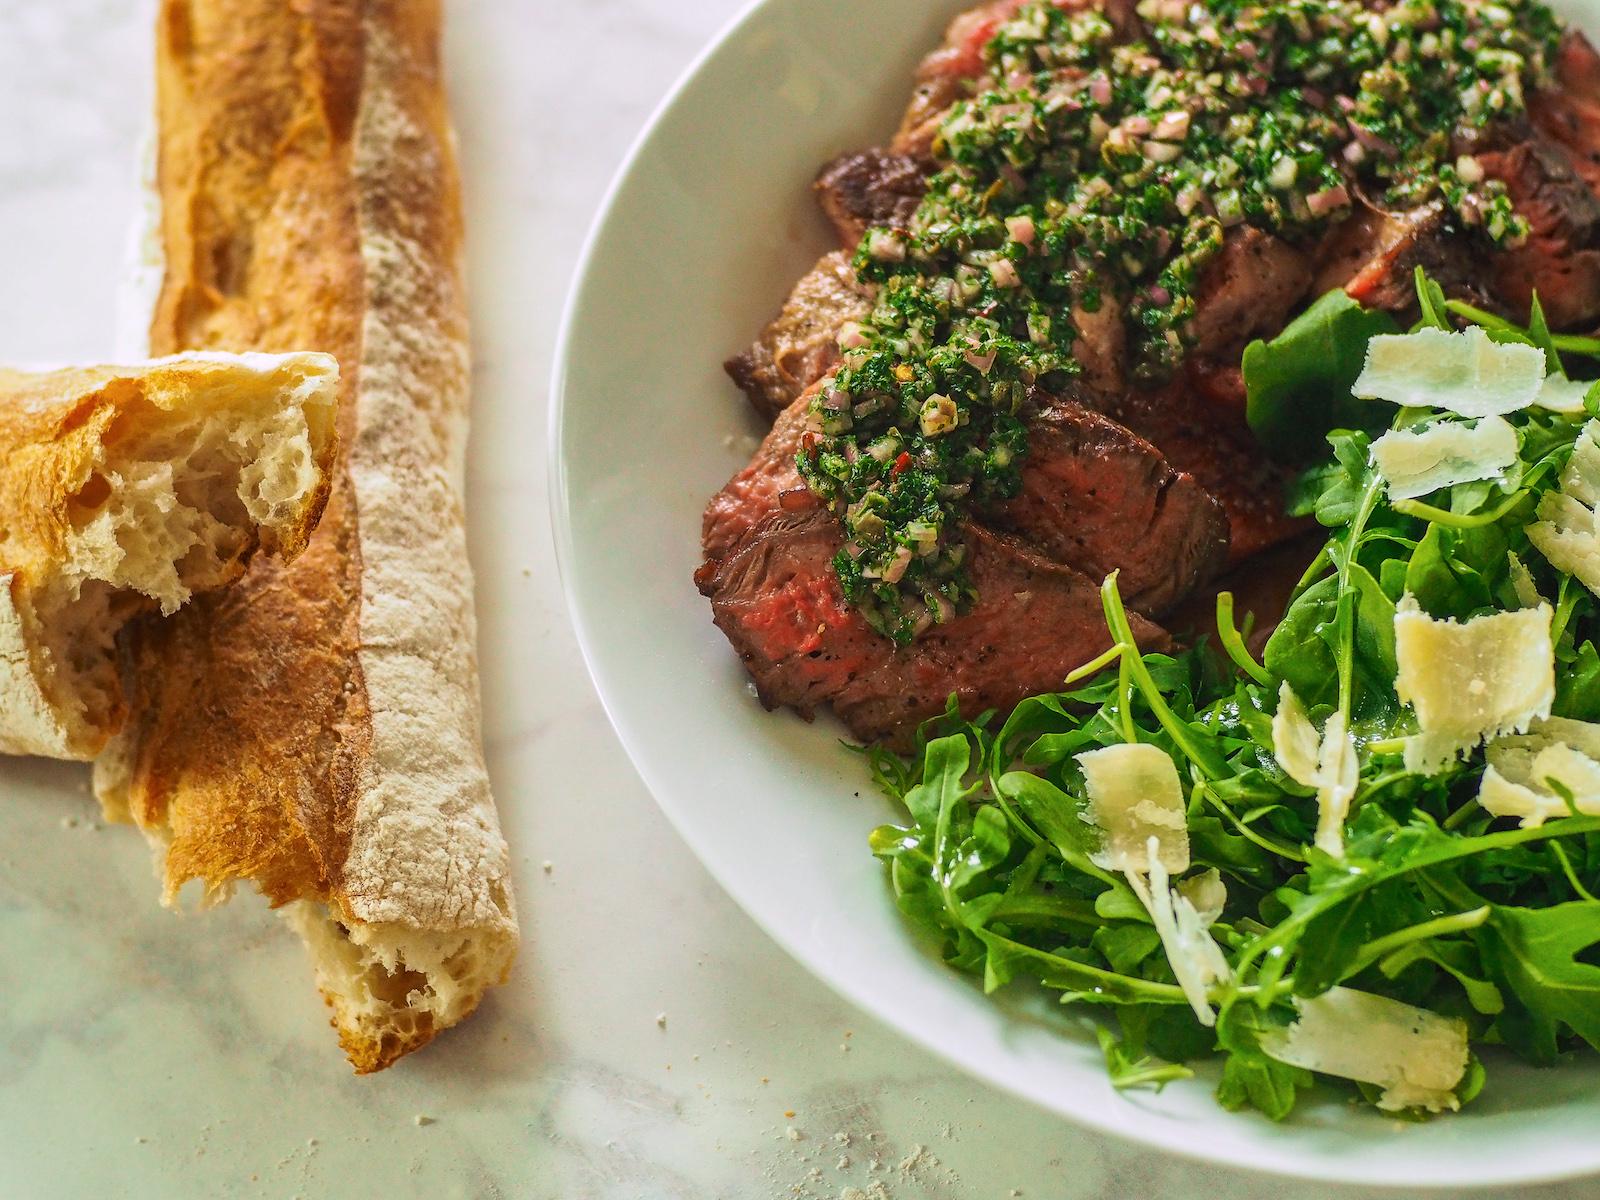 We Tried to Make Tavola's Amazing Rib Steak With Salsa Verde at Home